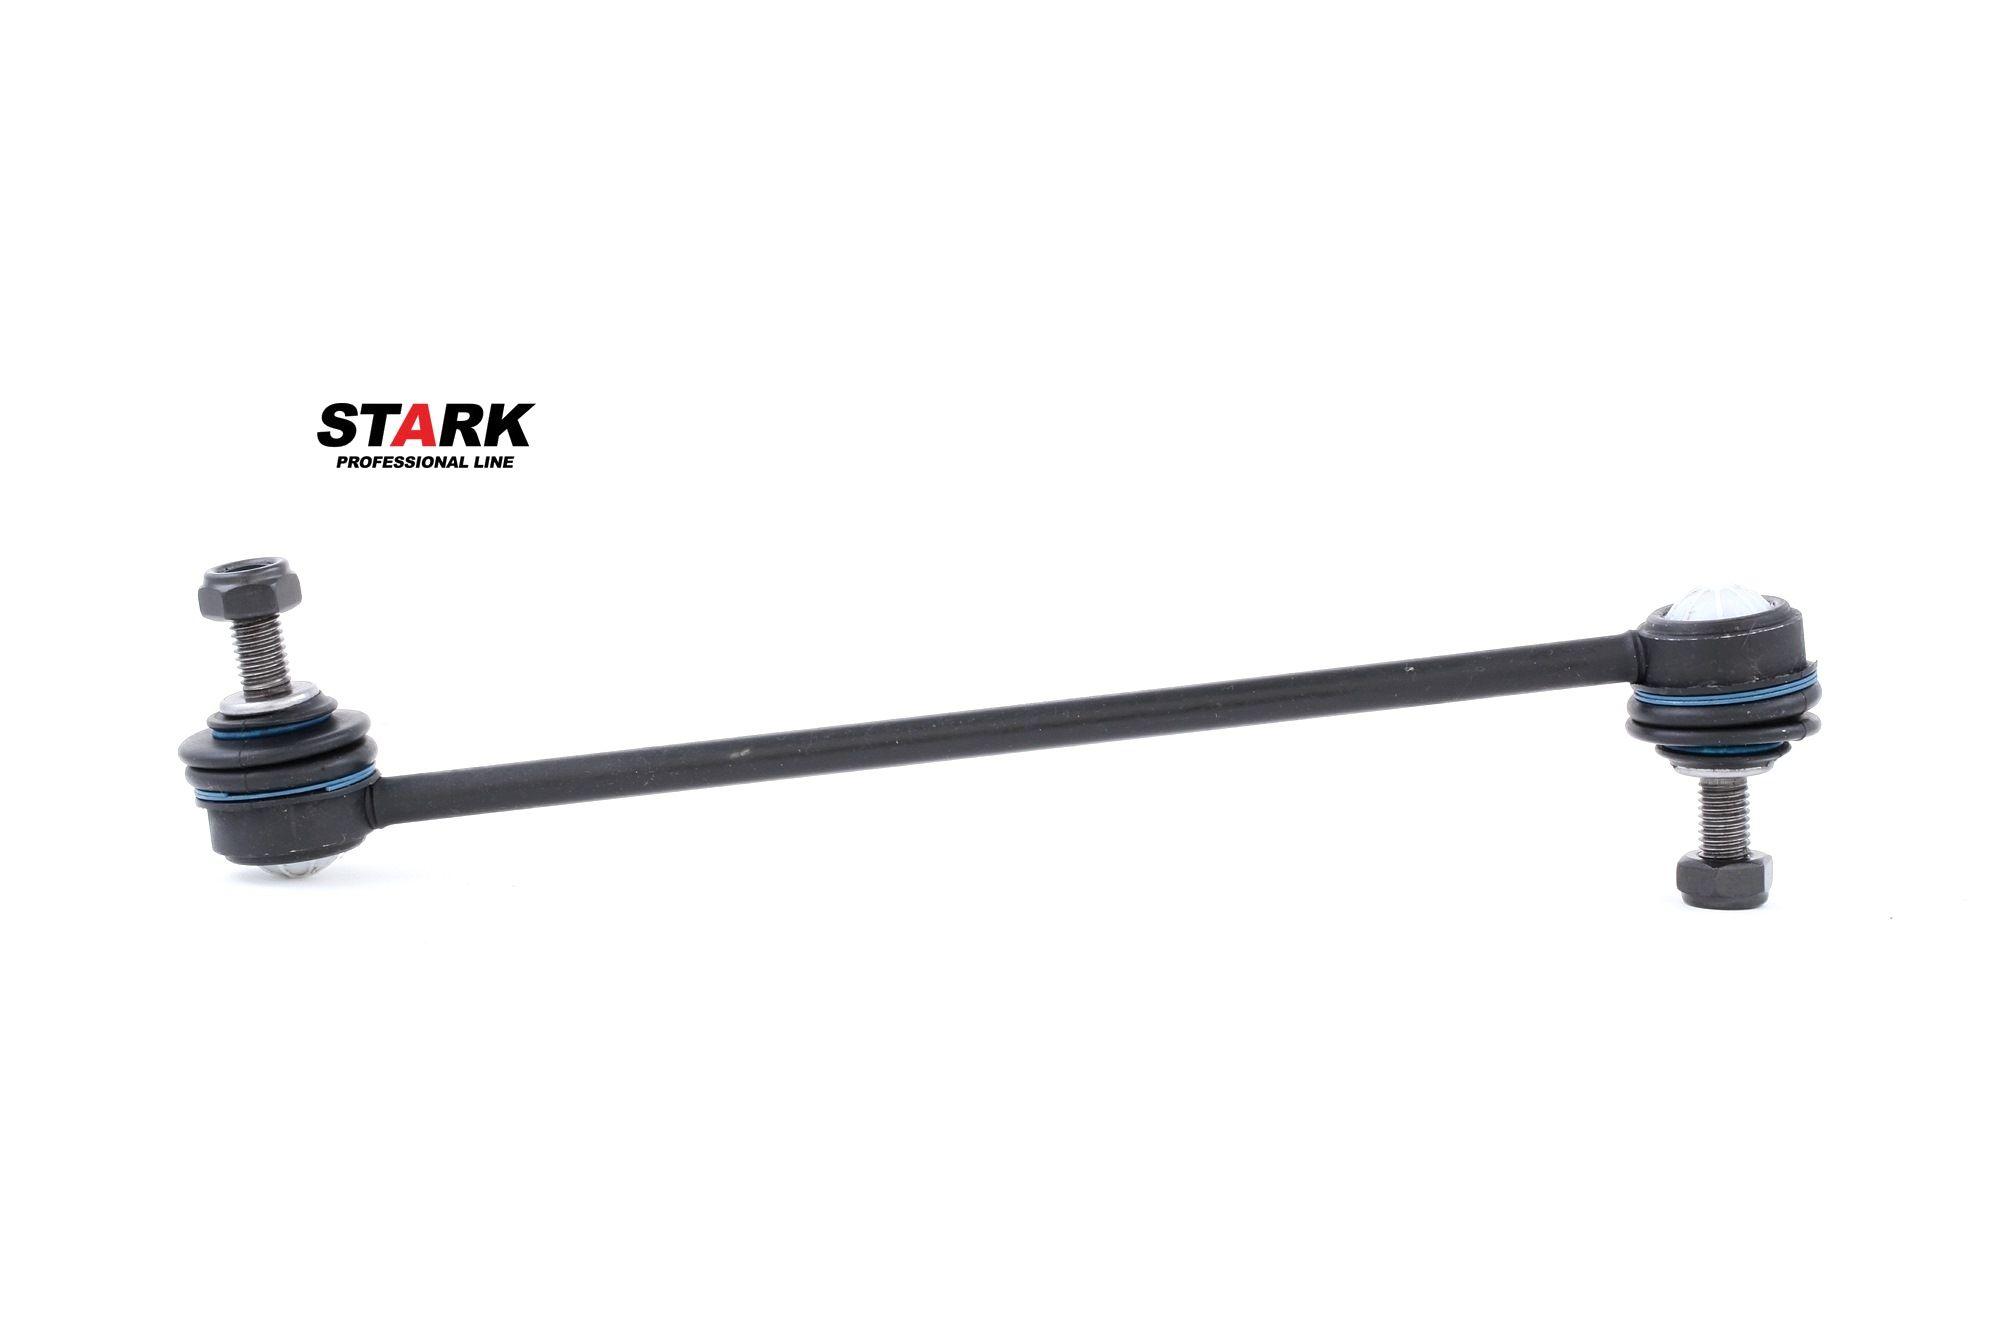 VW FOX 2012 Stabilisator Koppelstange - Original STARK SKST-0230010 Länge: 270mm